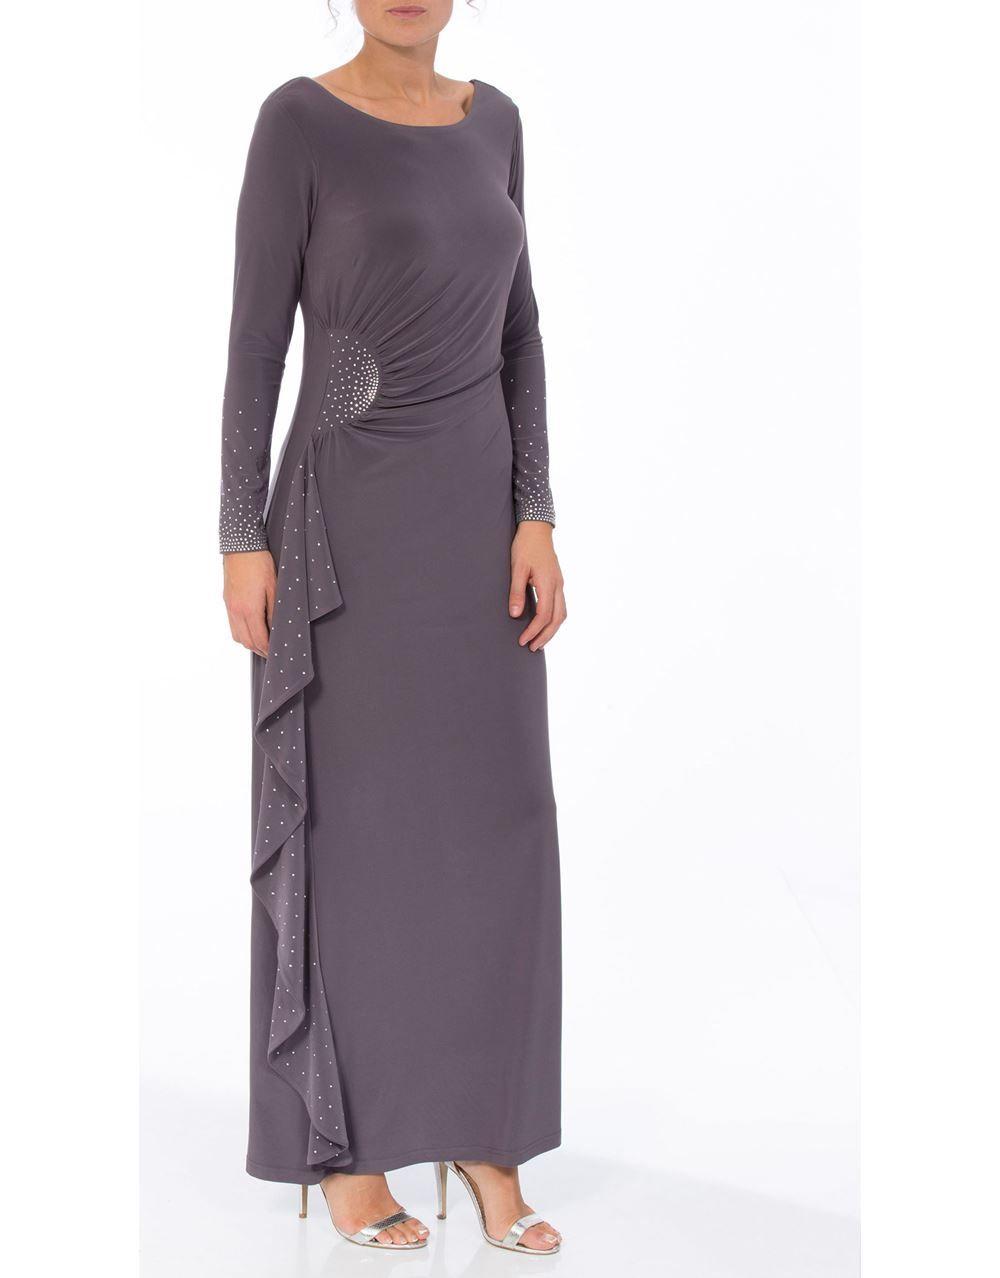 Embellished long sleeve maxi dress letus party pinterest long